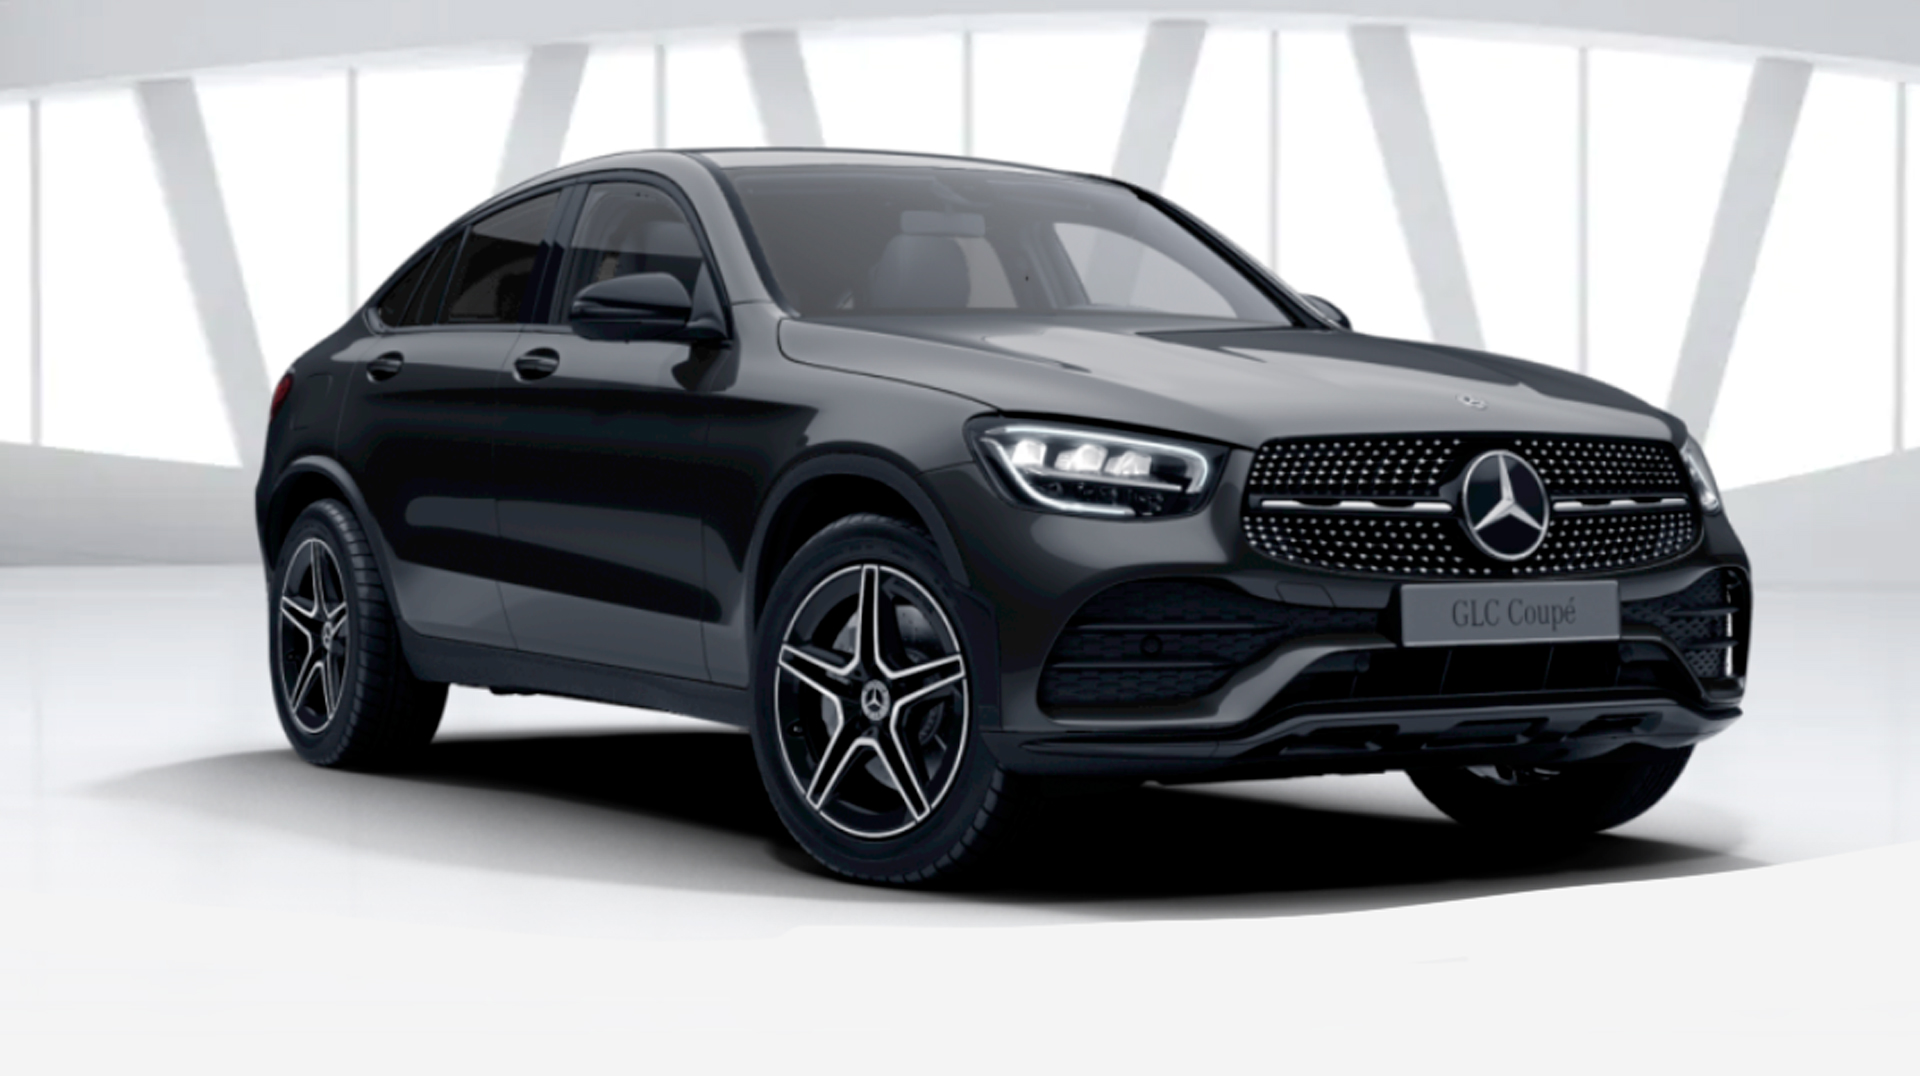 Mercedes-Benz GLC Coupe  0152620271